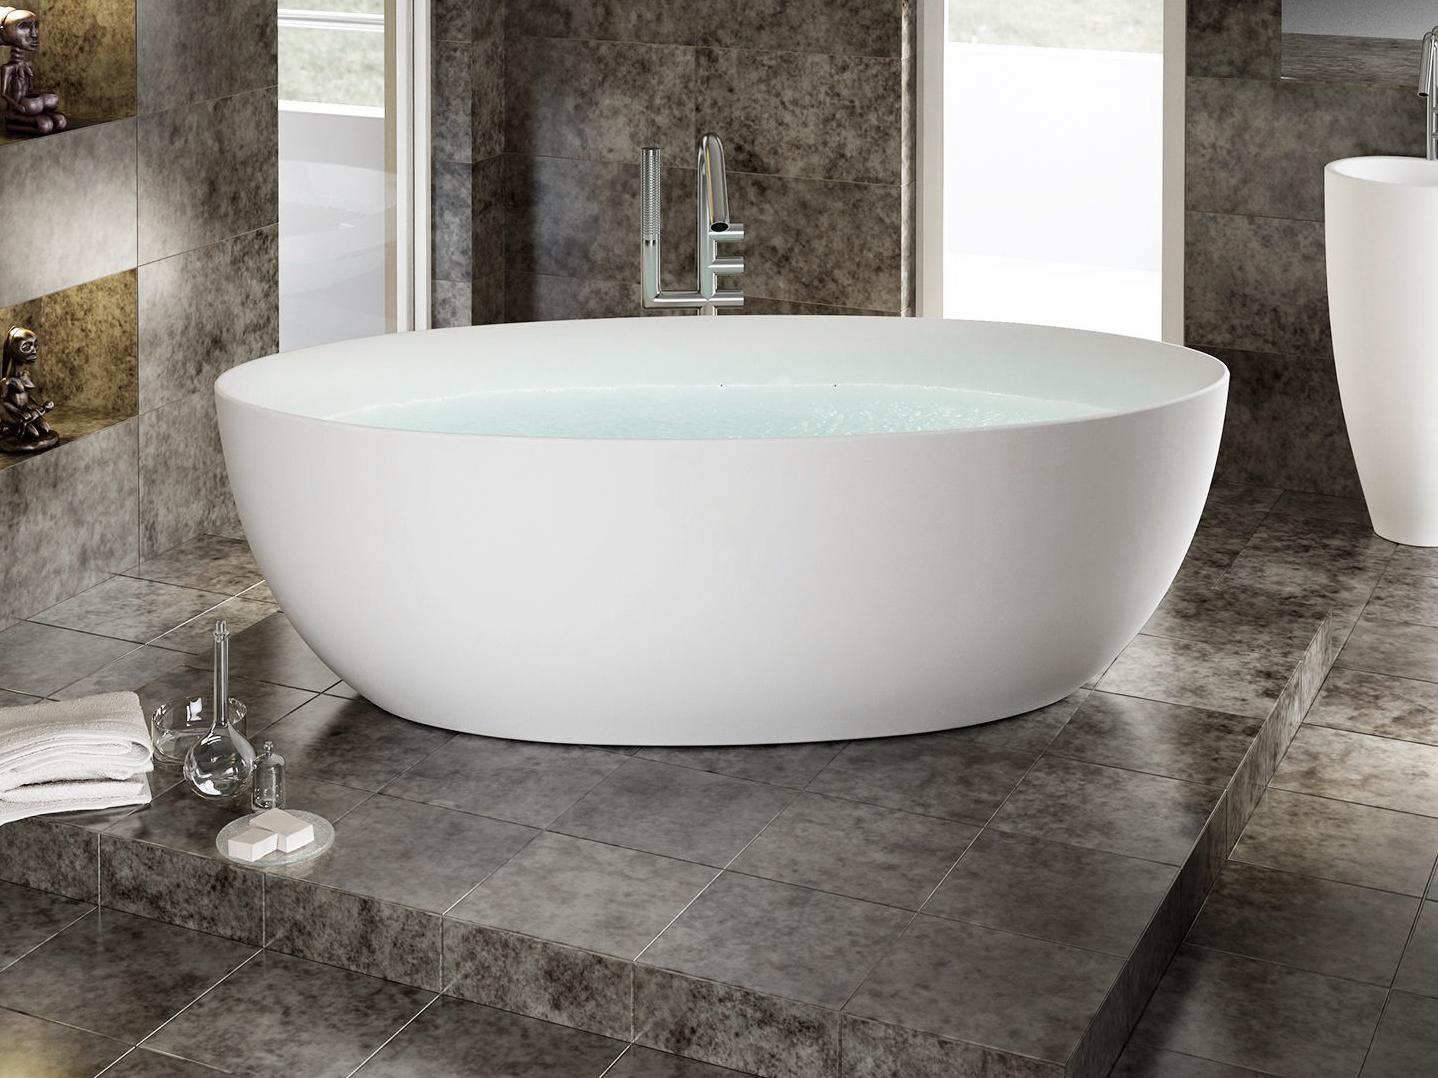 Vasca Da Bagno Opaca : Vasche da bagno villeroy boch